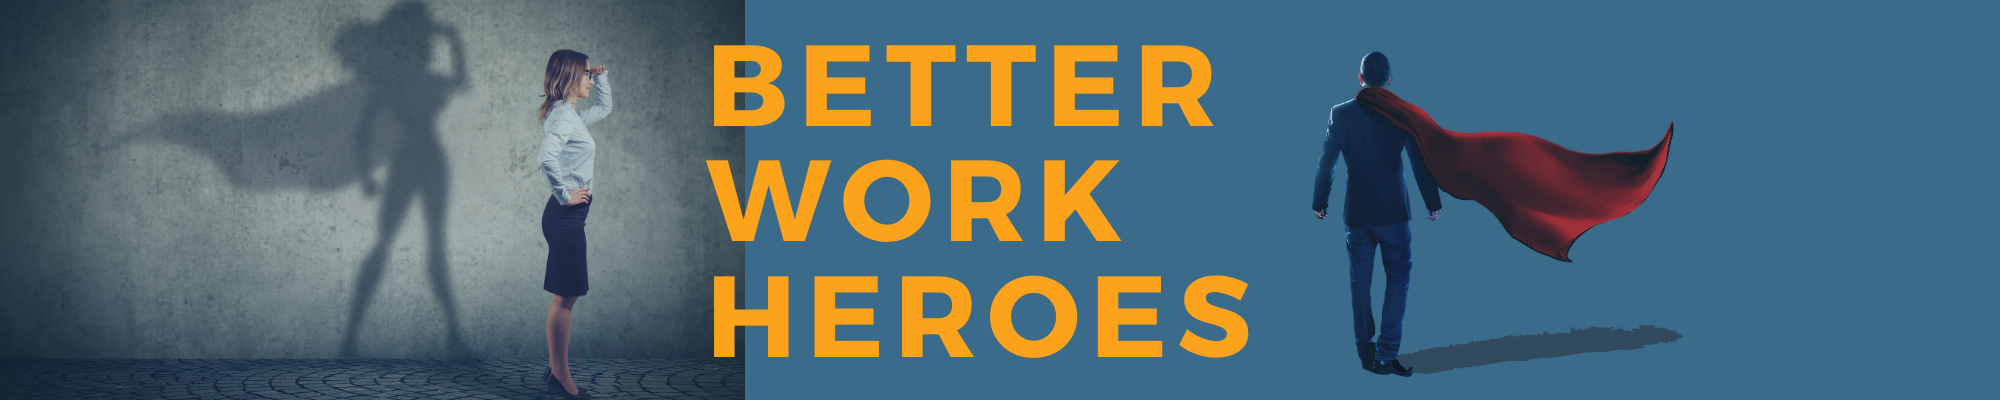 Better Work Heroes